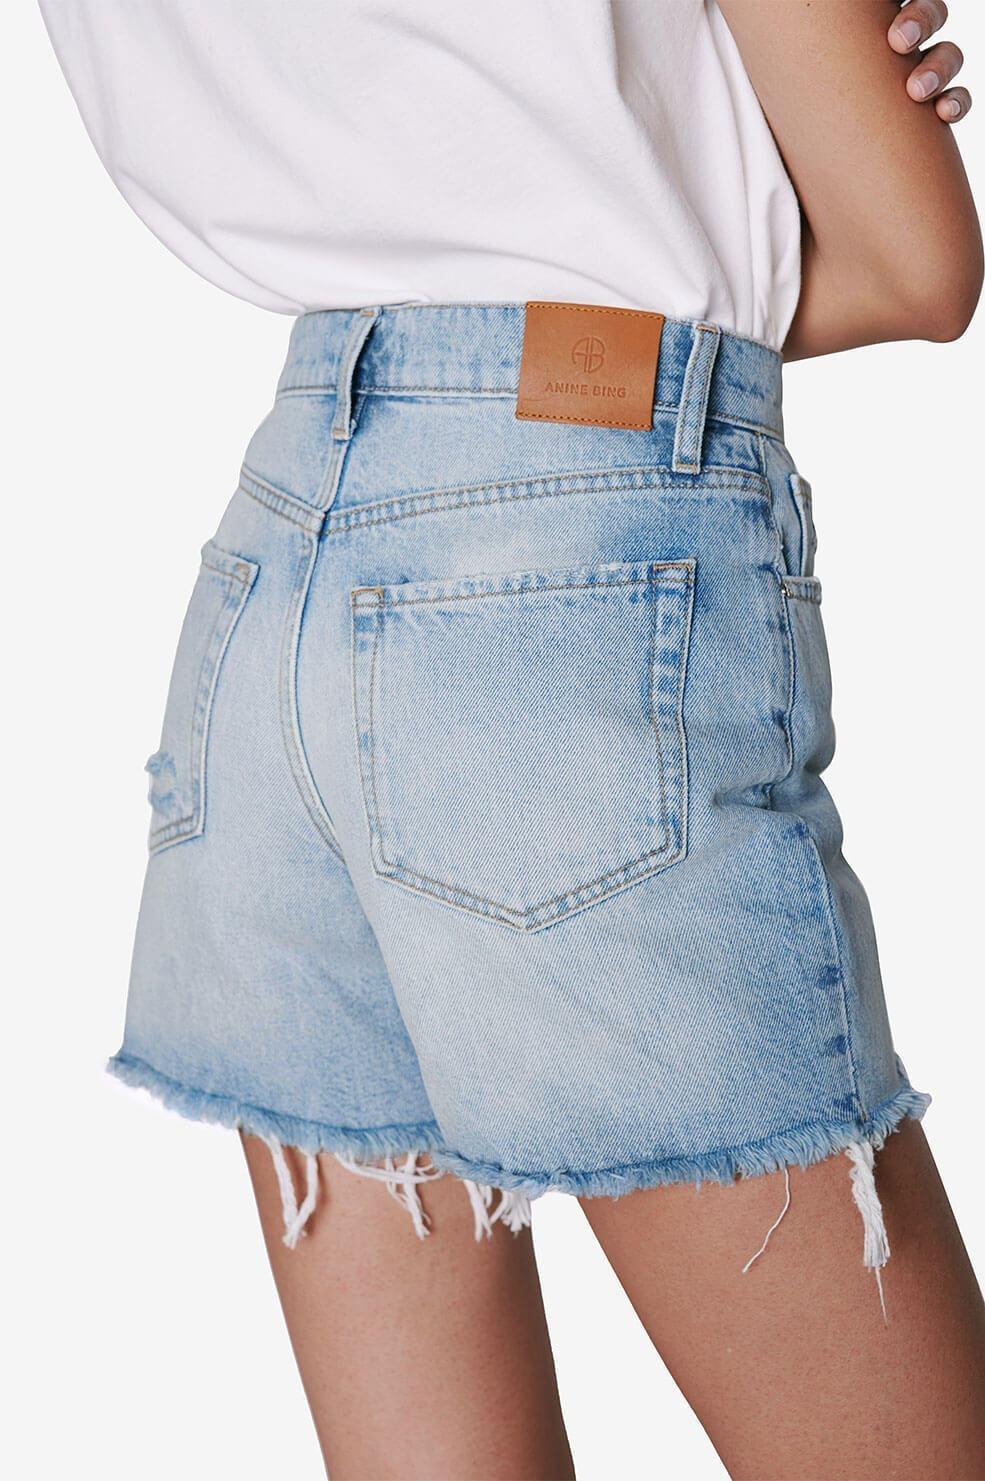 ANINE BING short court jeans-3